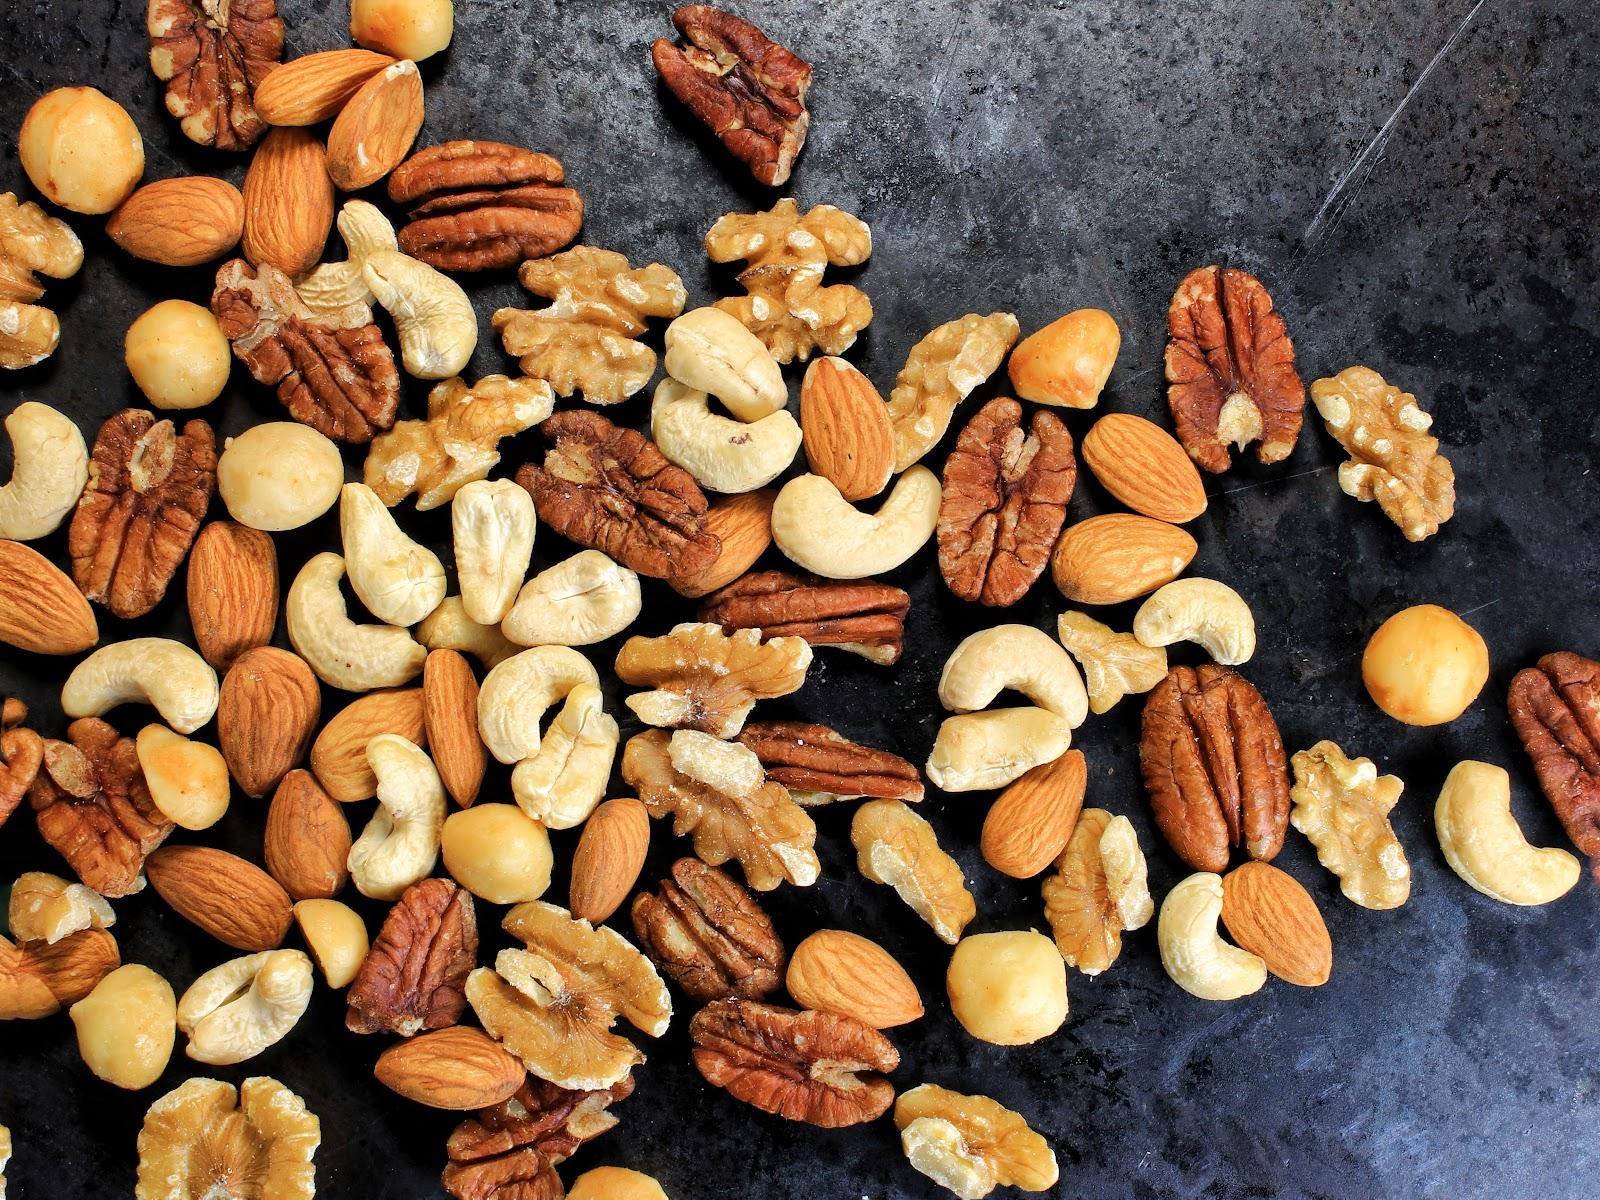 Macadamia, Almonds, walnuts, pecans